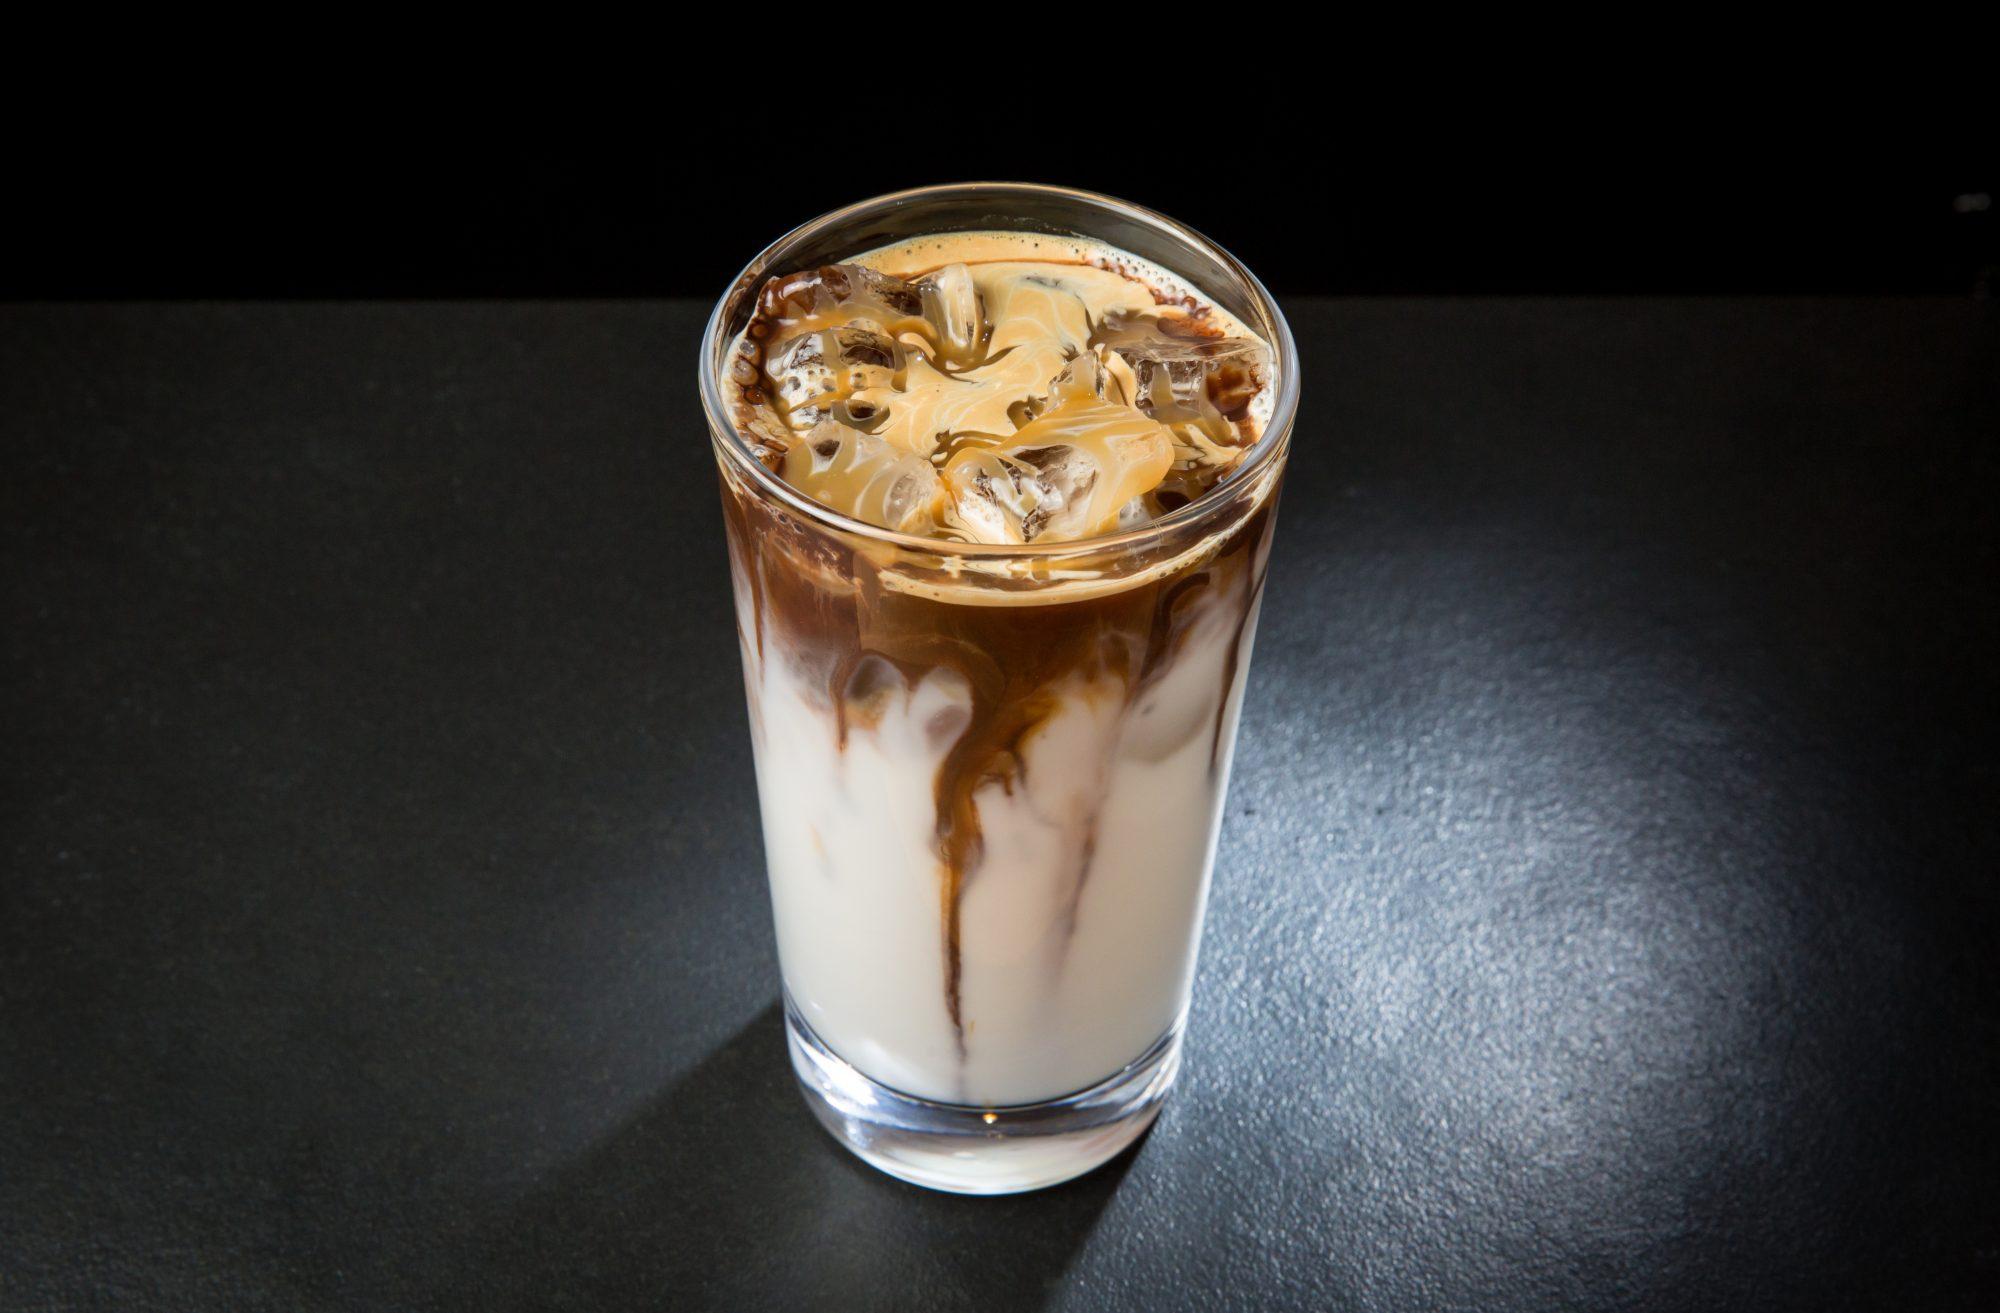 Starbucks_Iced_Coconut_Milk_Mocha_Macchiato_2017_image